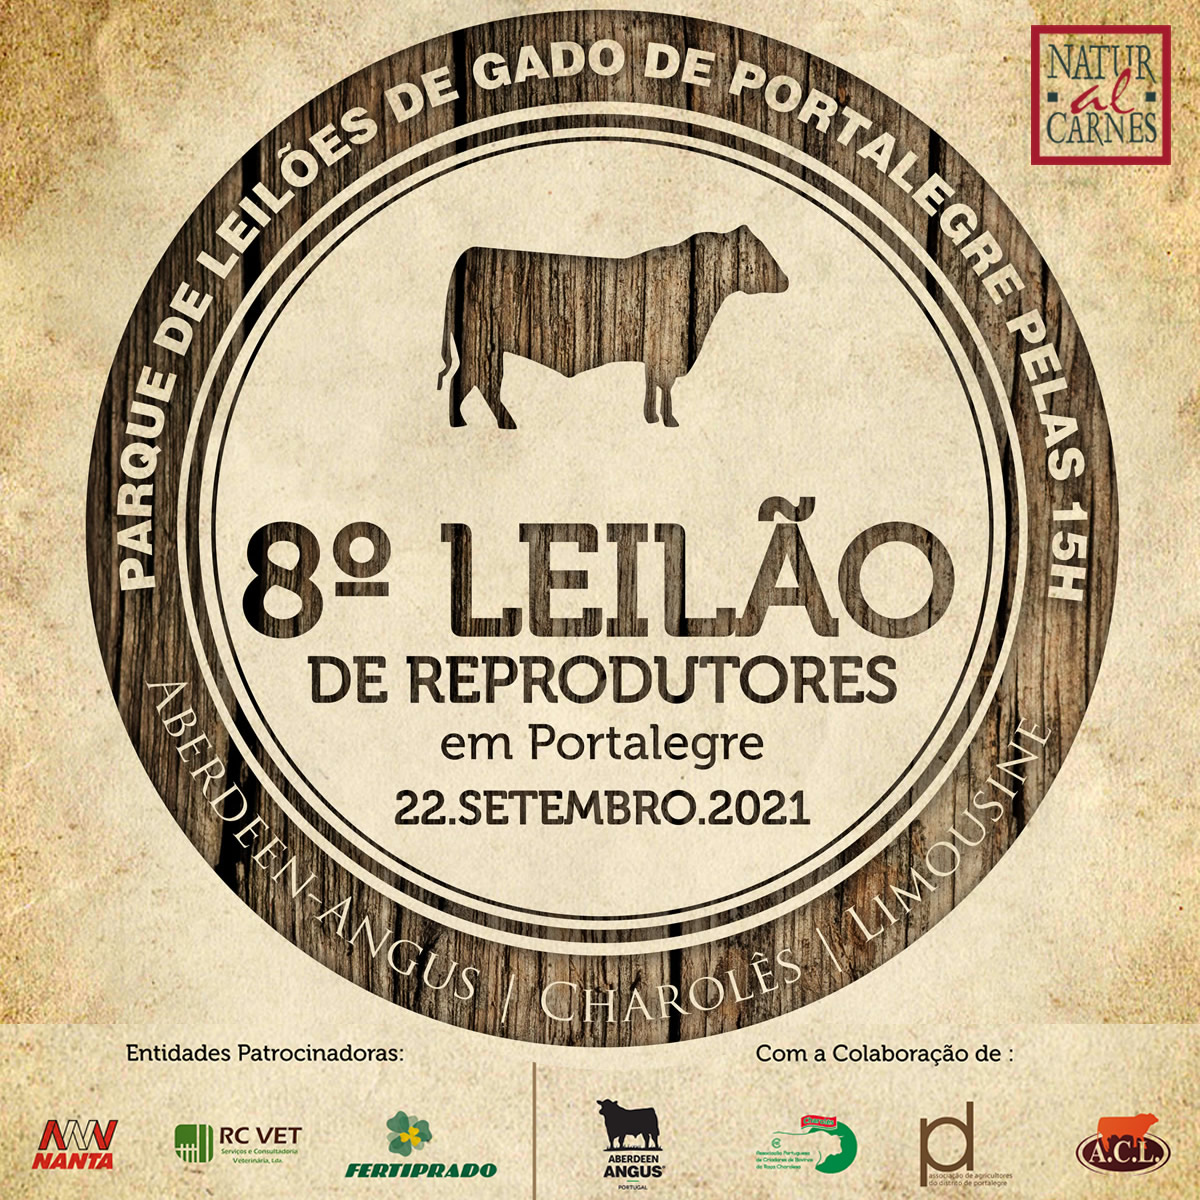 leilao_reprodutores_naturalcanes.jpg (485 KB)